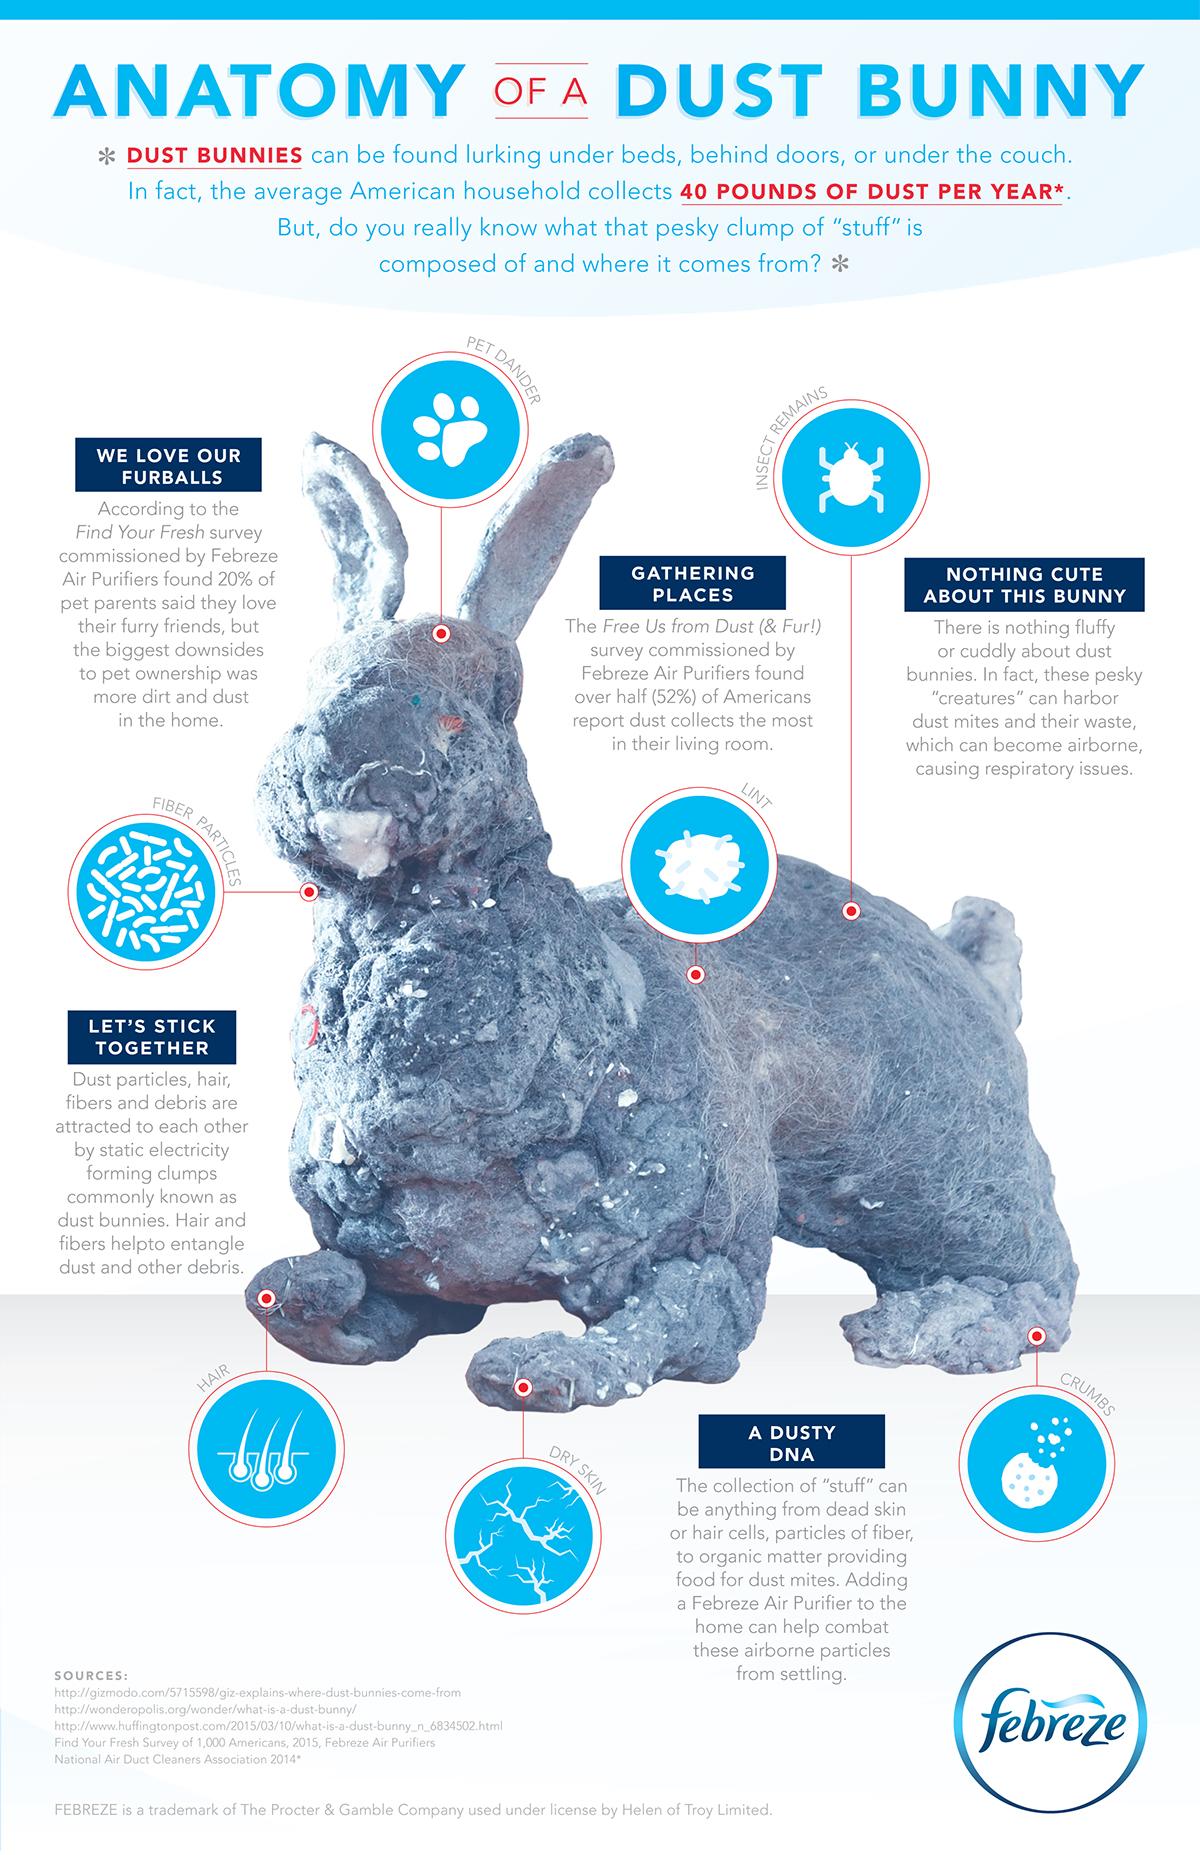 Febreze: Anatomy of a Dust Bunny Infographic on Behance